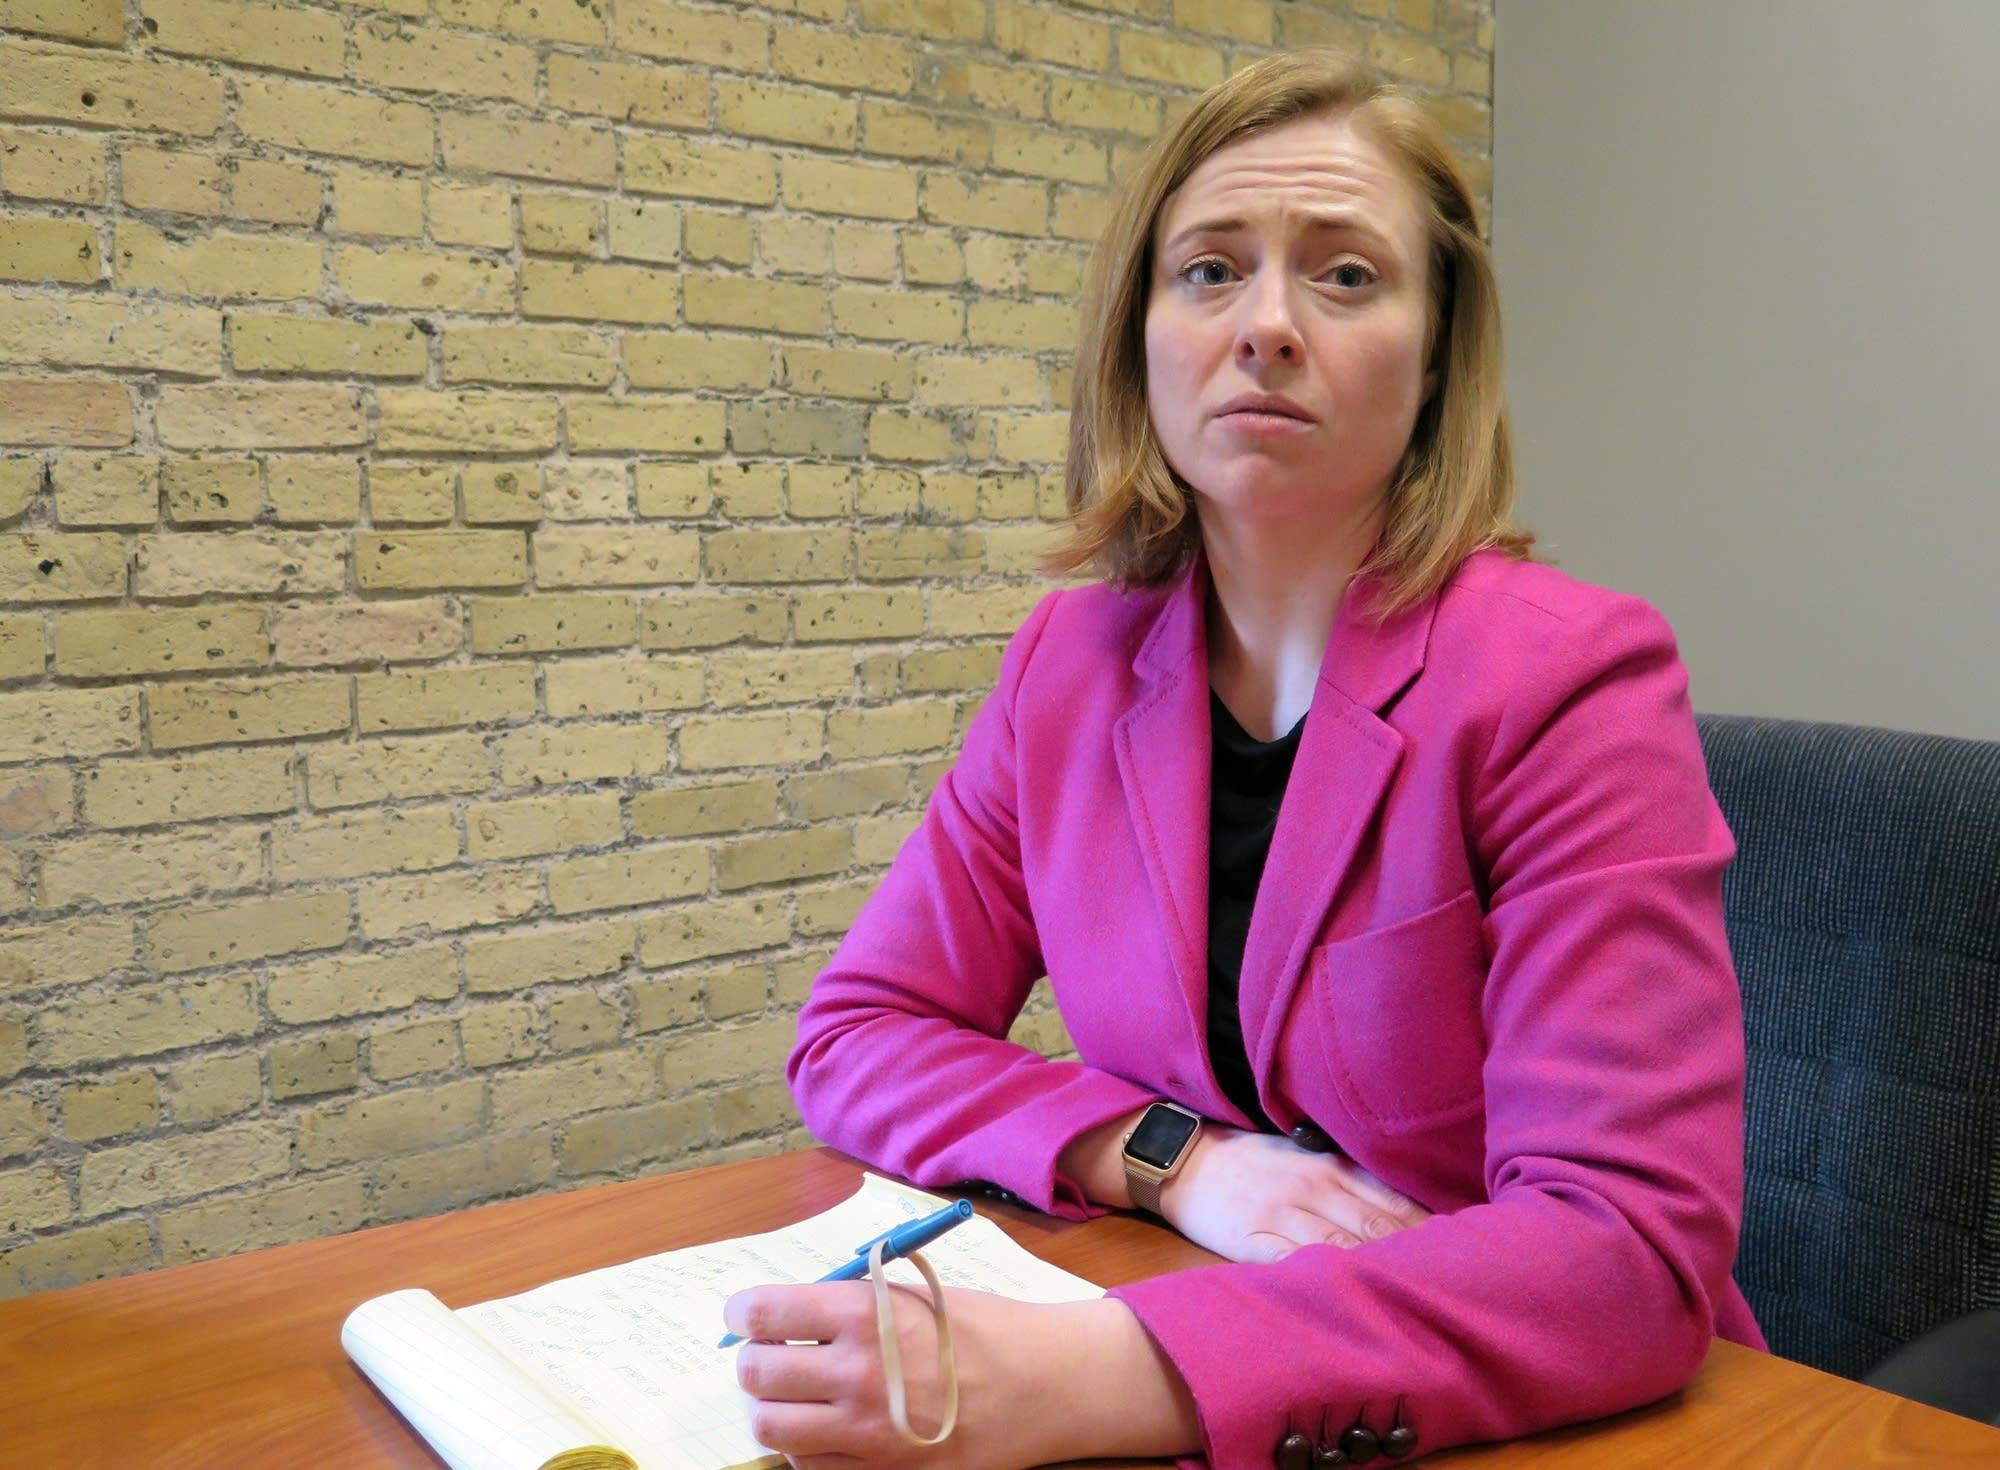 Immigration attorney Kara Lynum